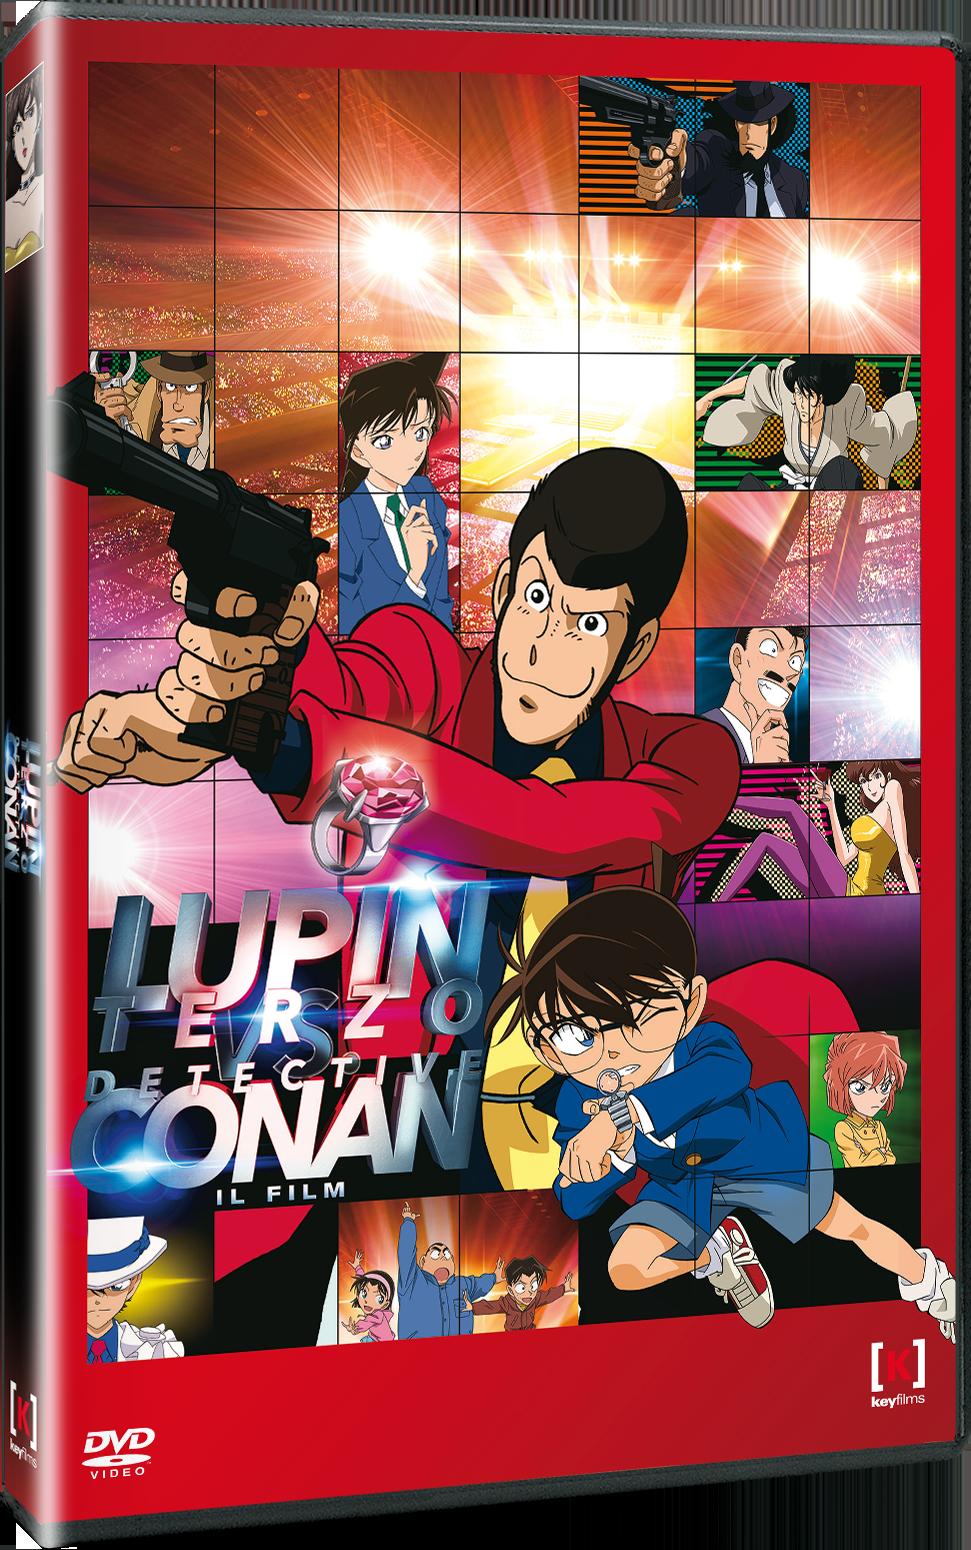 lupin terzo vs detective conan dvd